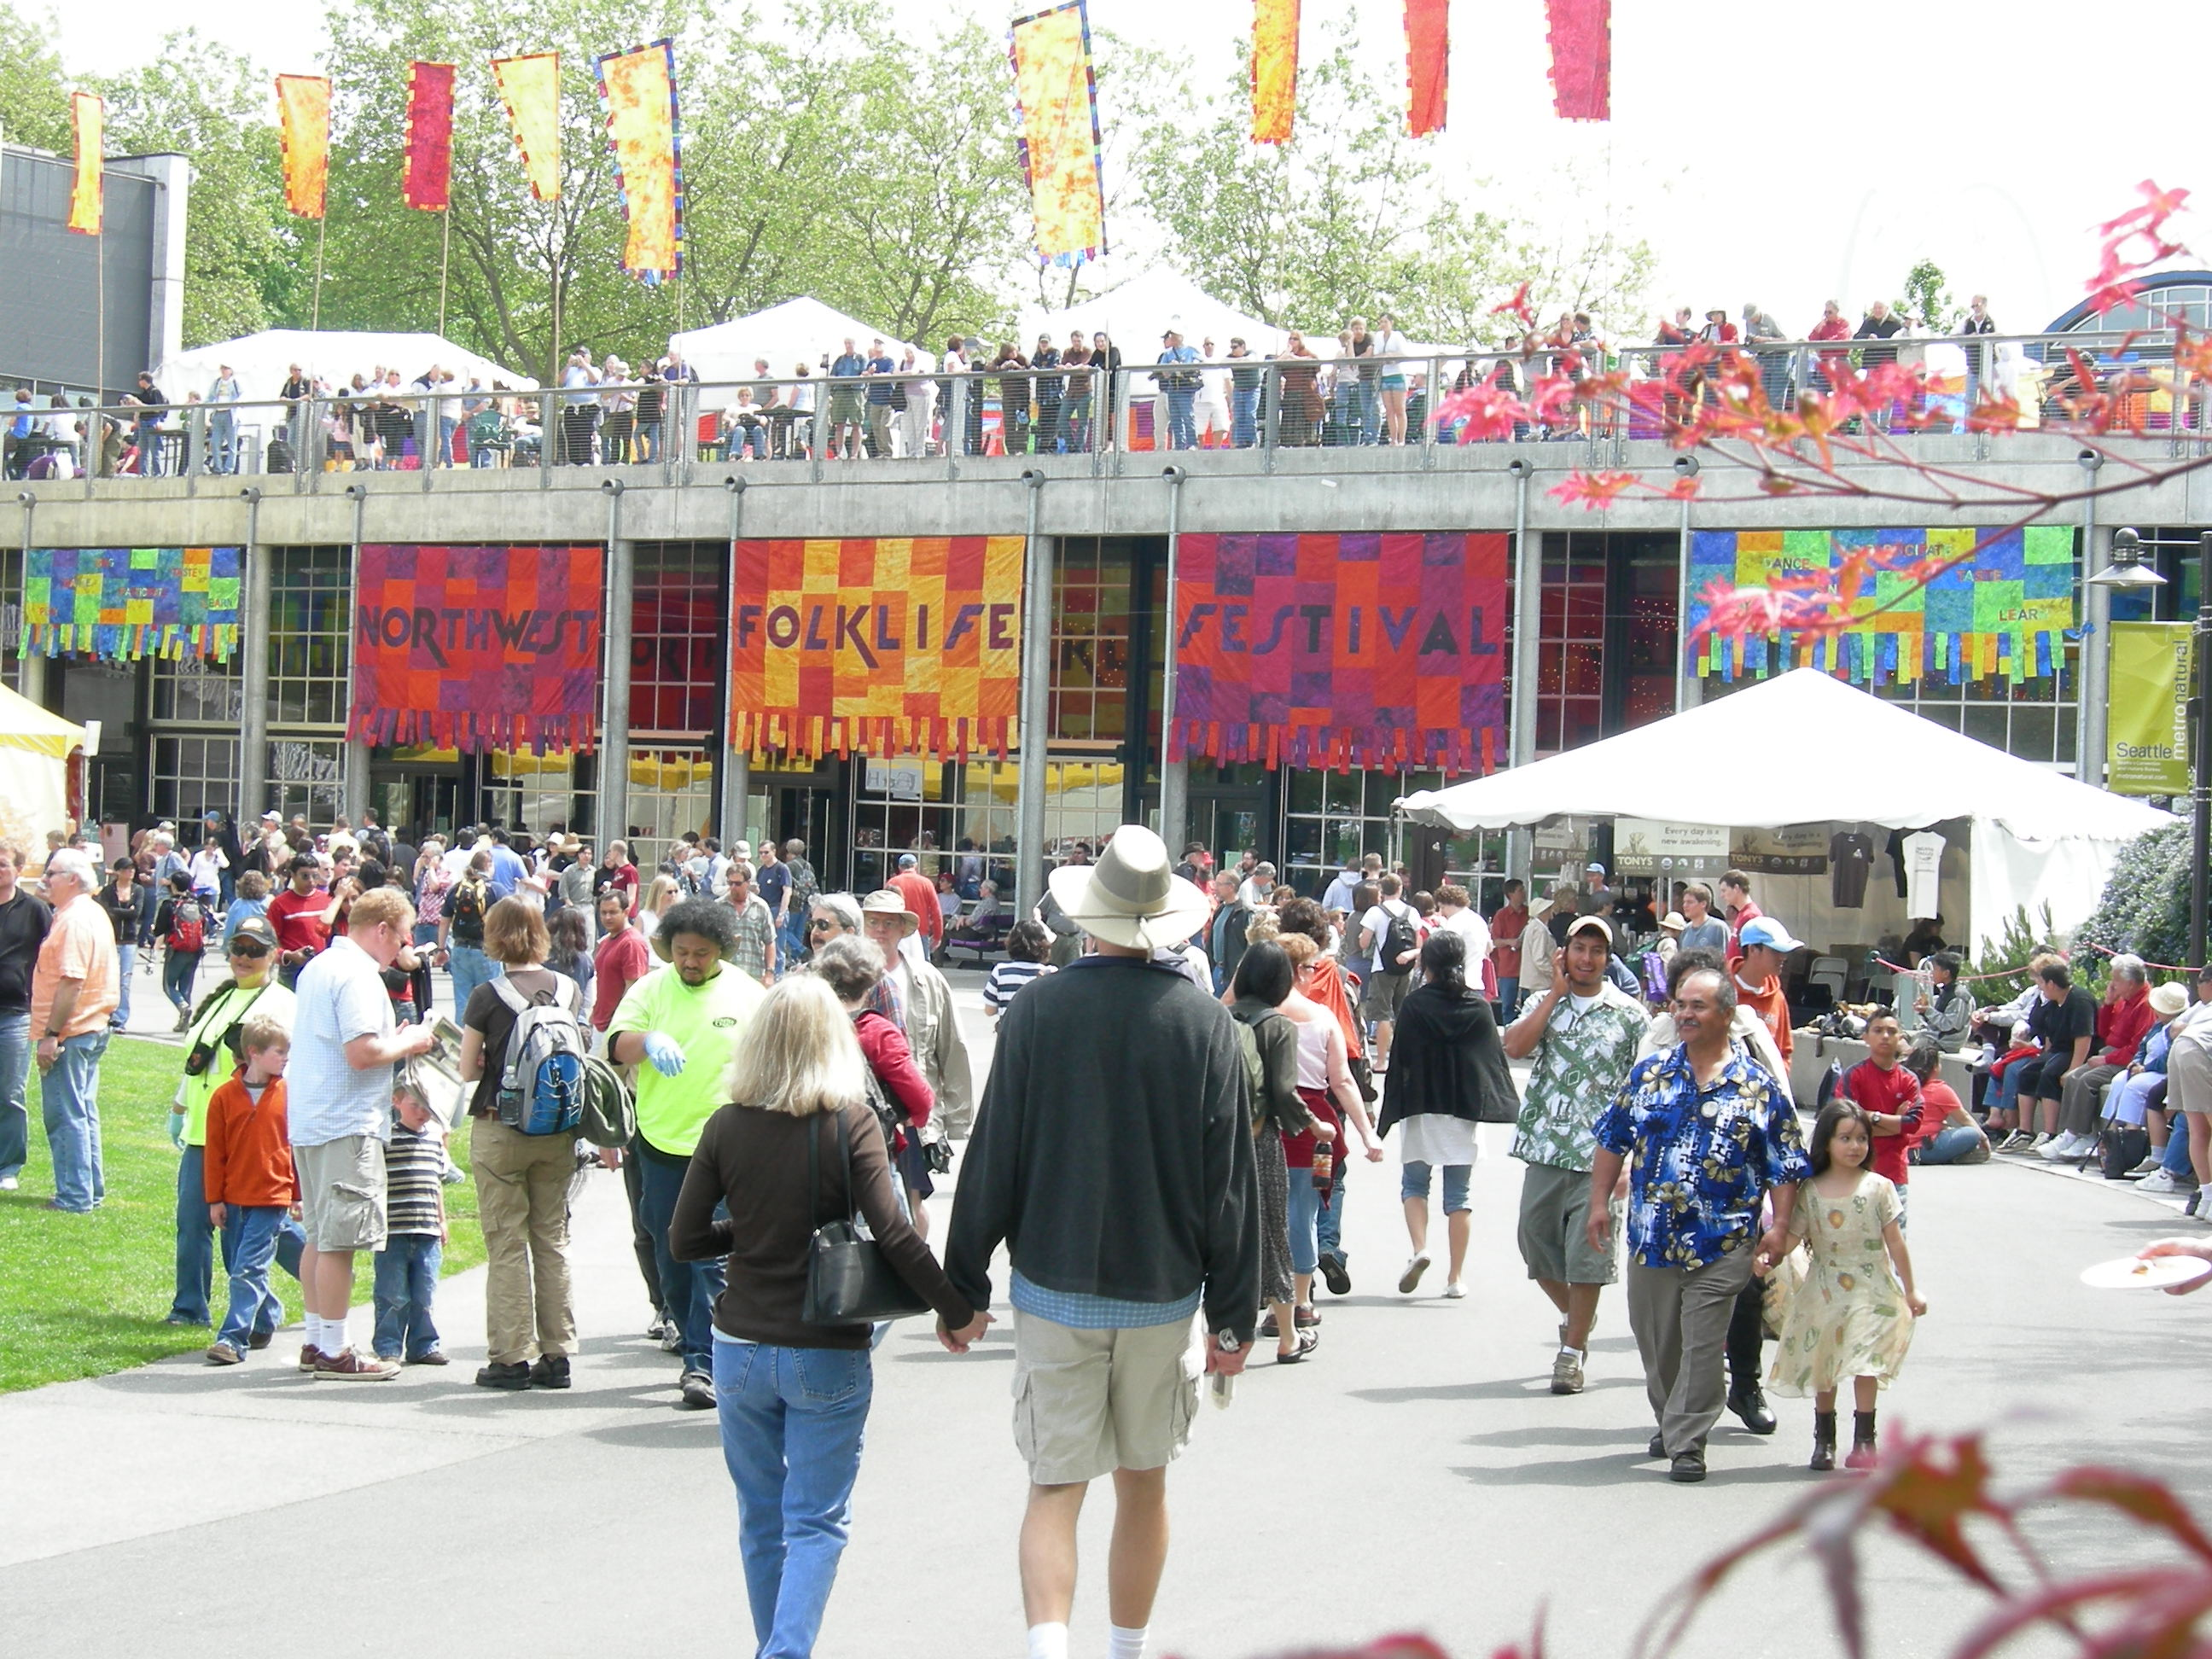 NW Folklife Memorial Day Weekend Schedule